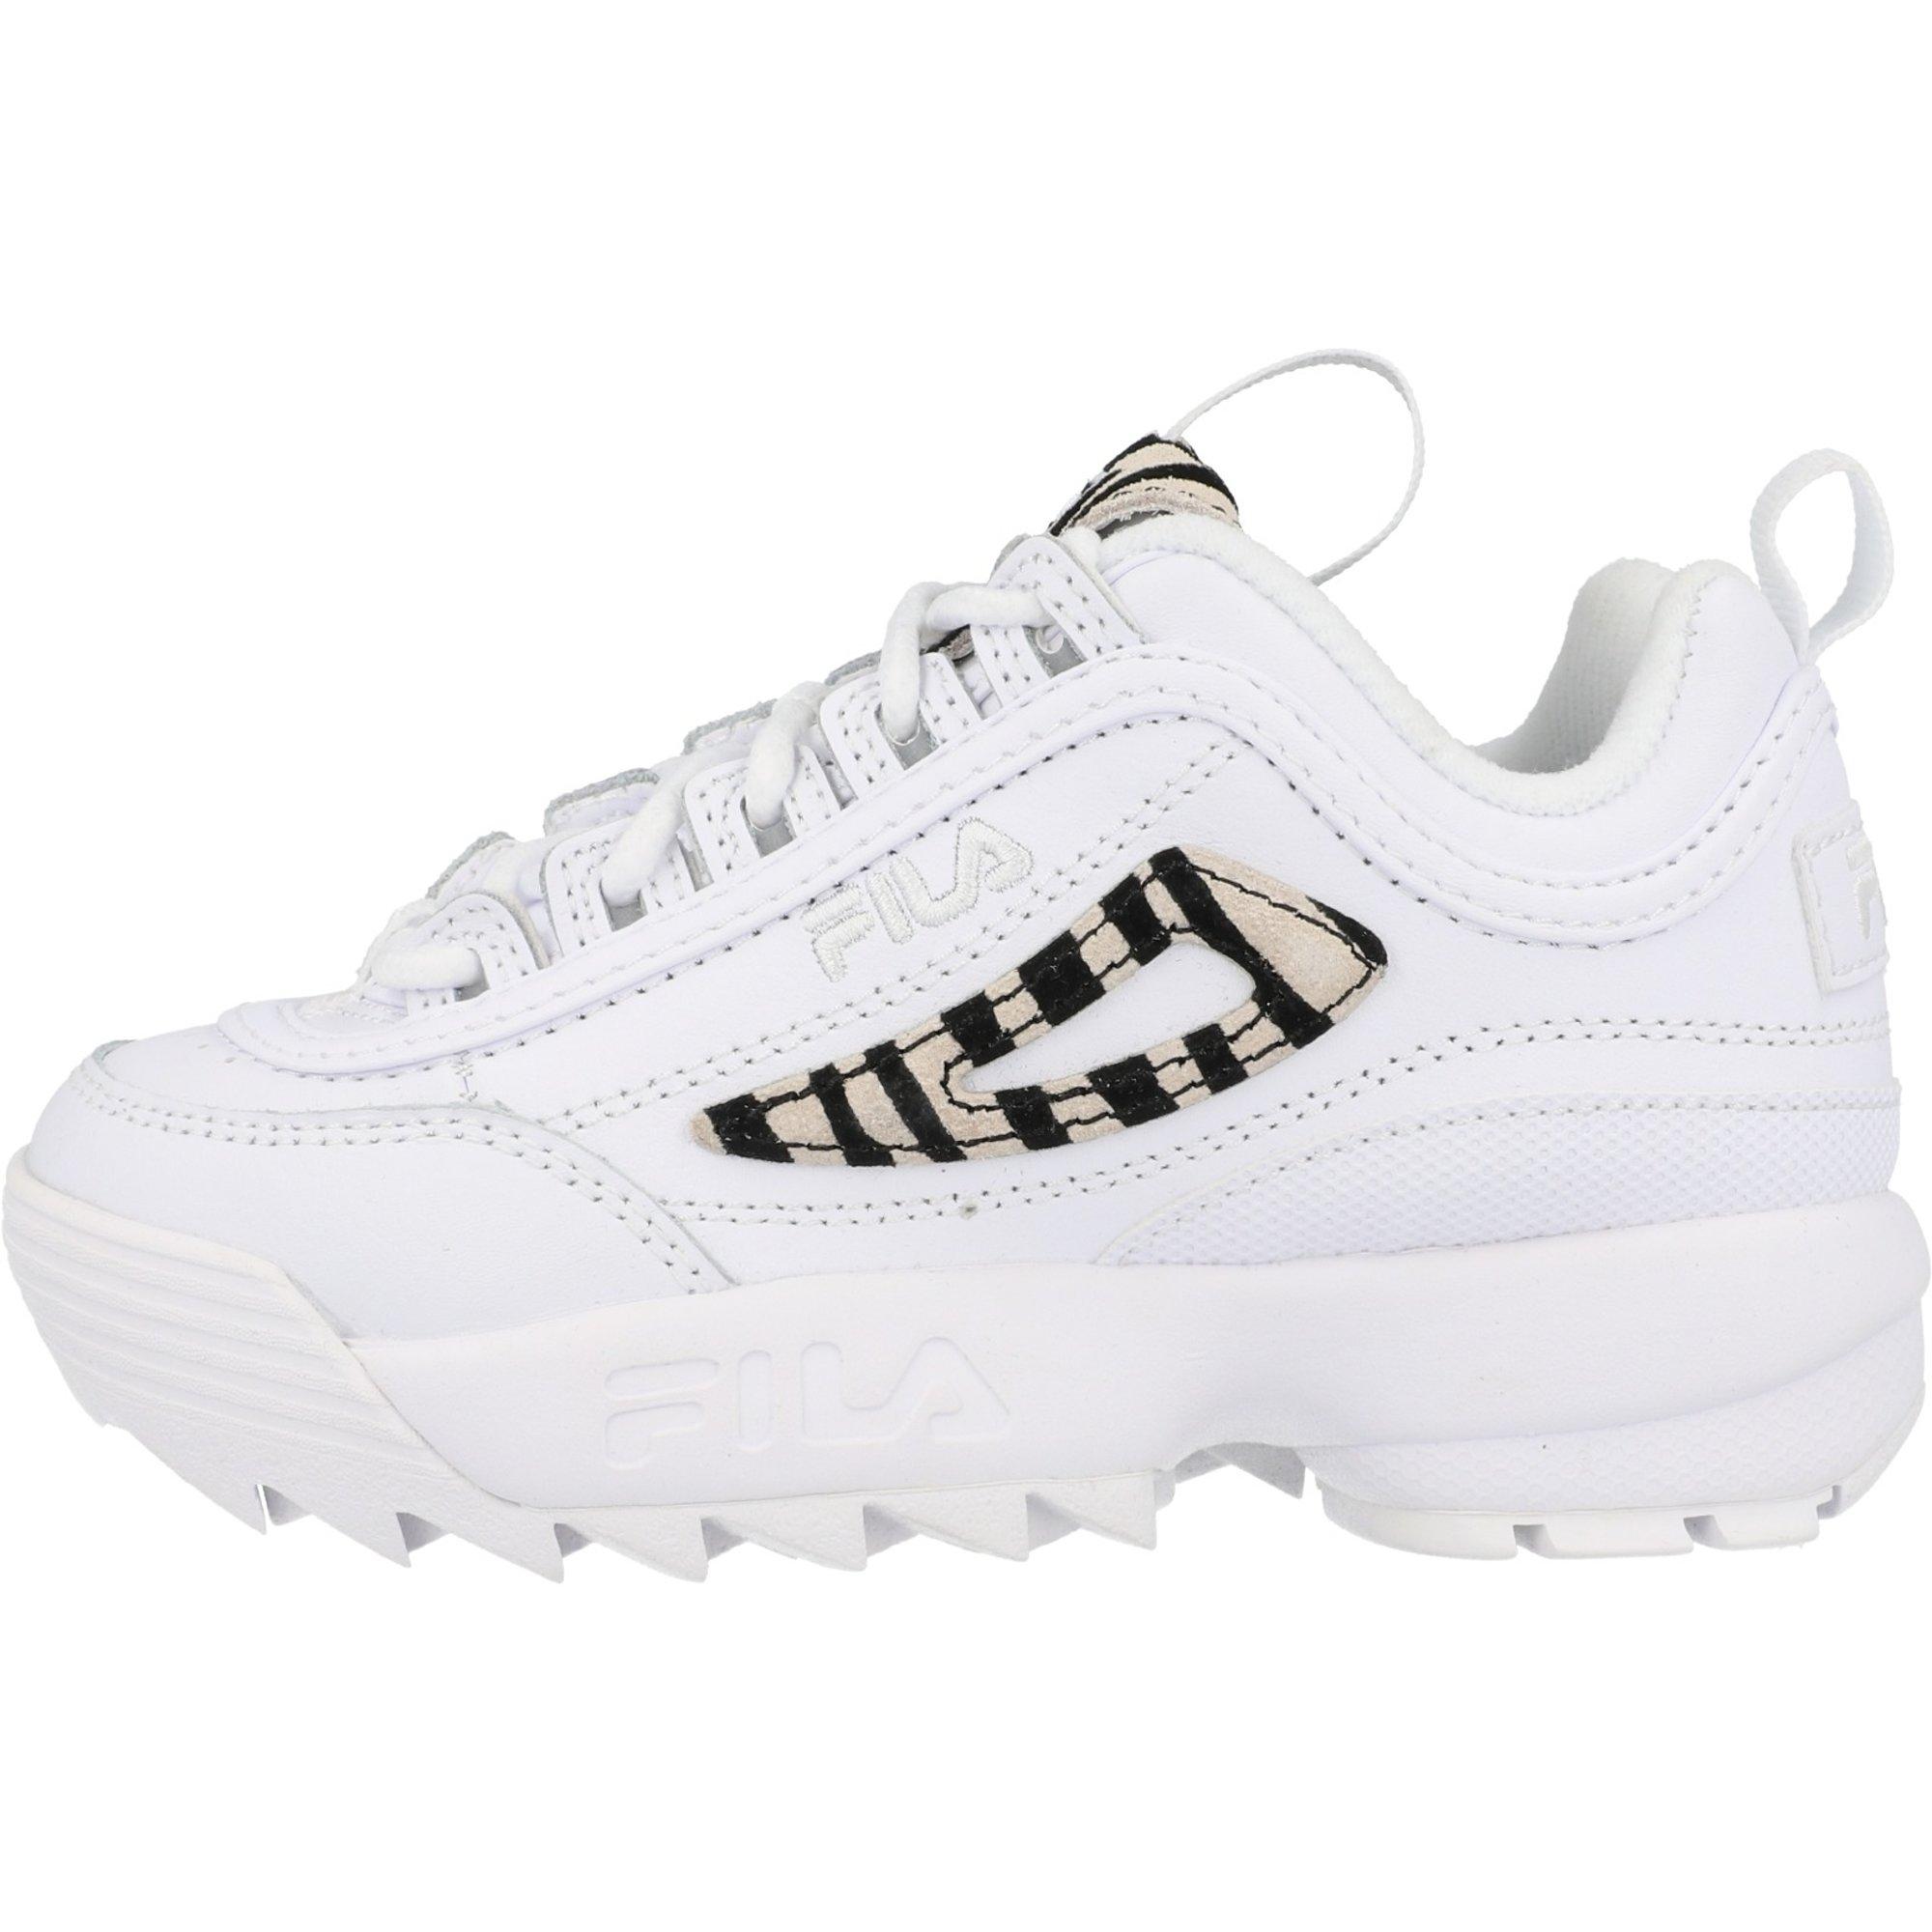 FILA Disruptor II Zebra White Leather